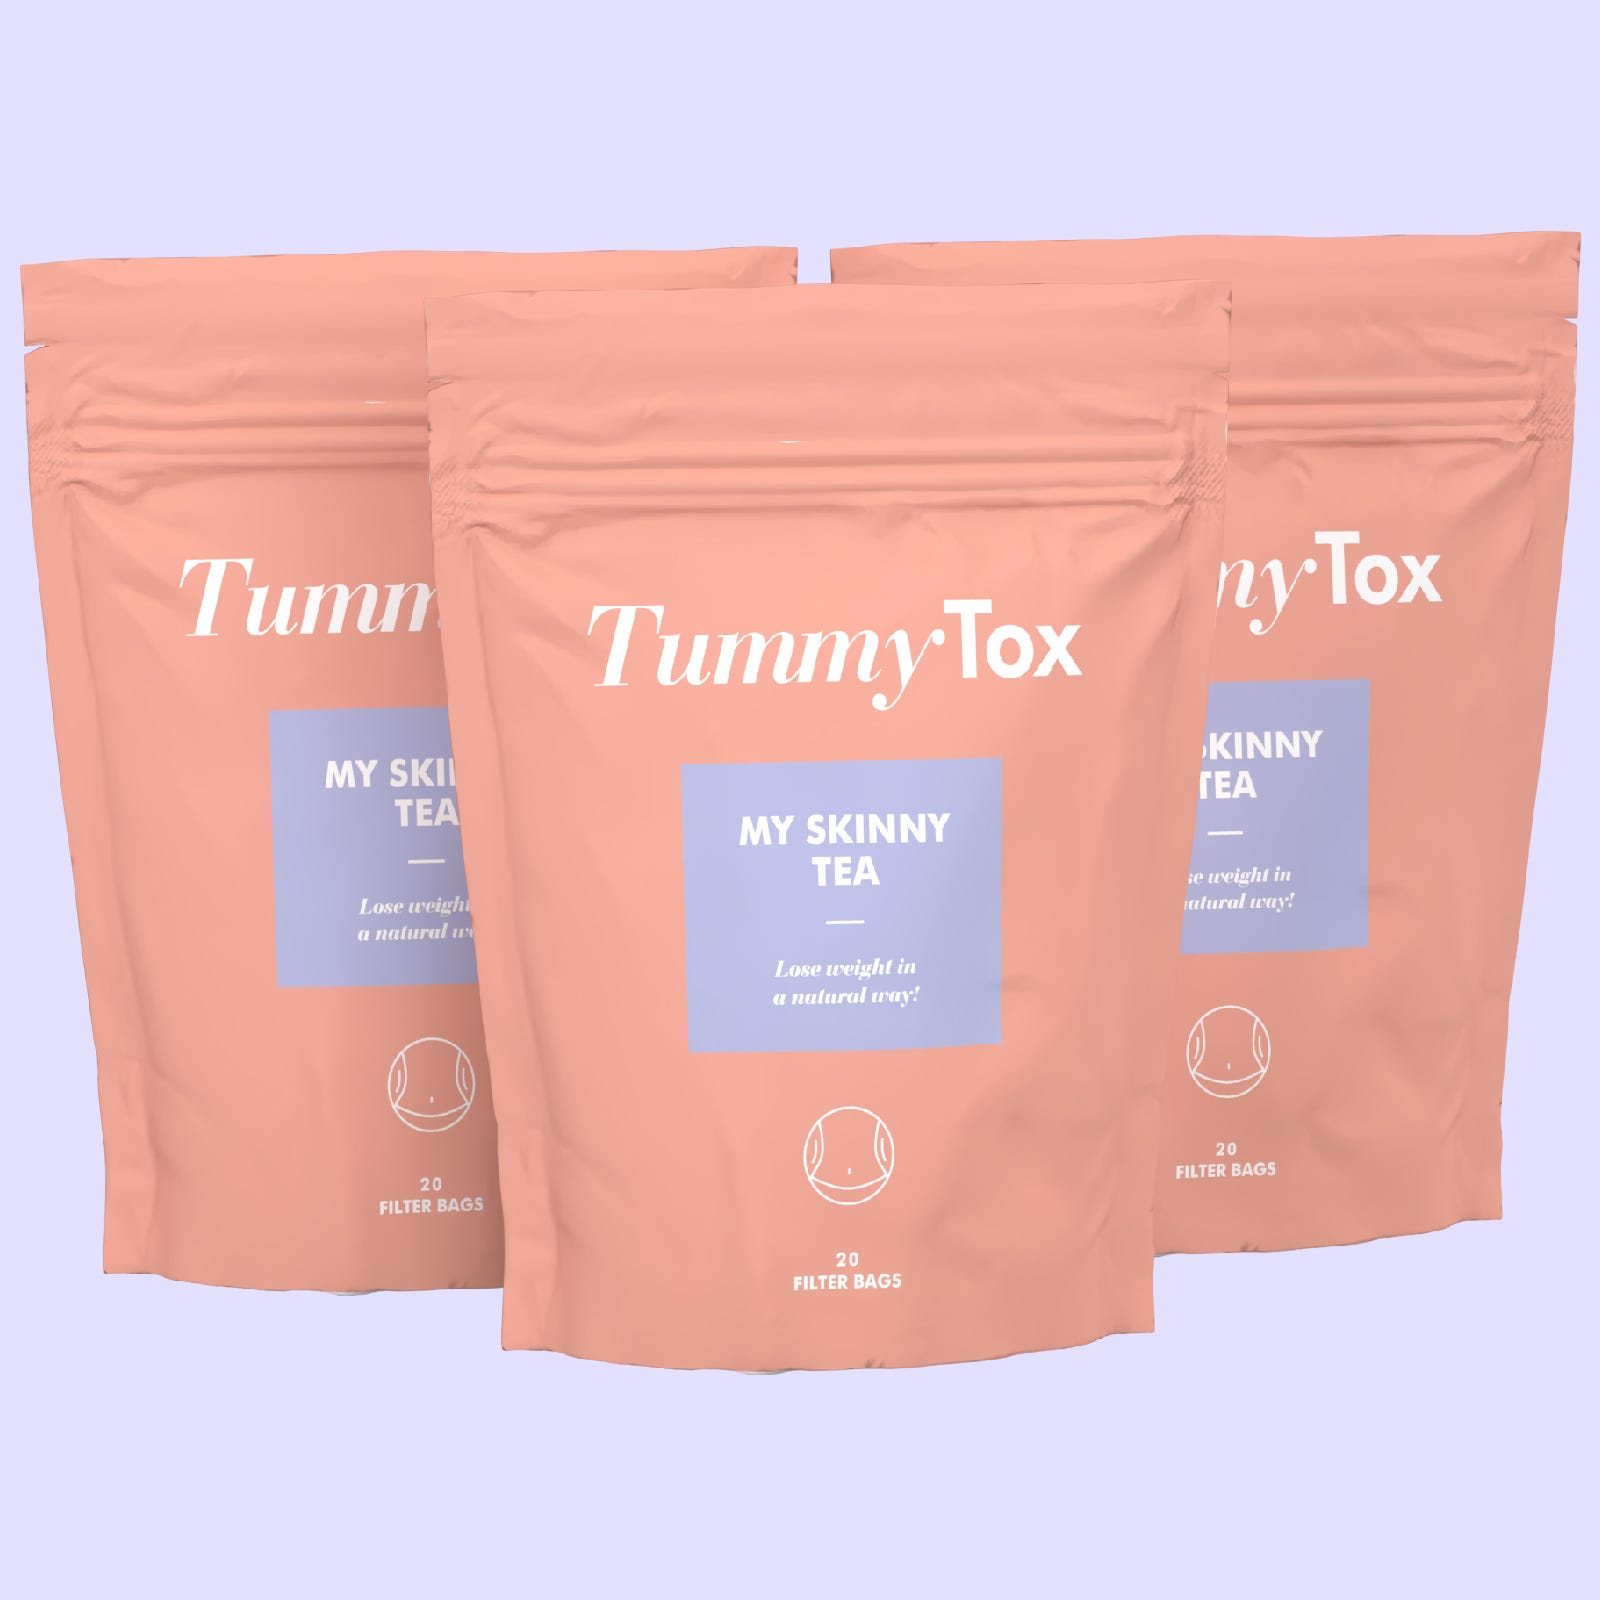 Skinny Me Tea | 1+2 GRATIS | Tisana dimagrante | Aiuta a bruciare i grassi | 3x 20 bustine per una cura di 2 mesi | TummyTox.